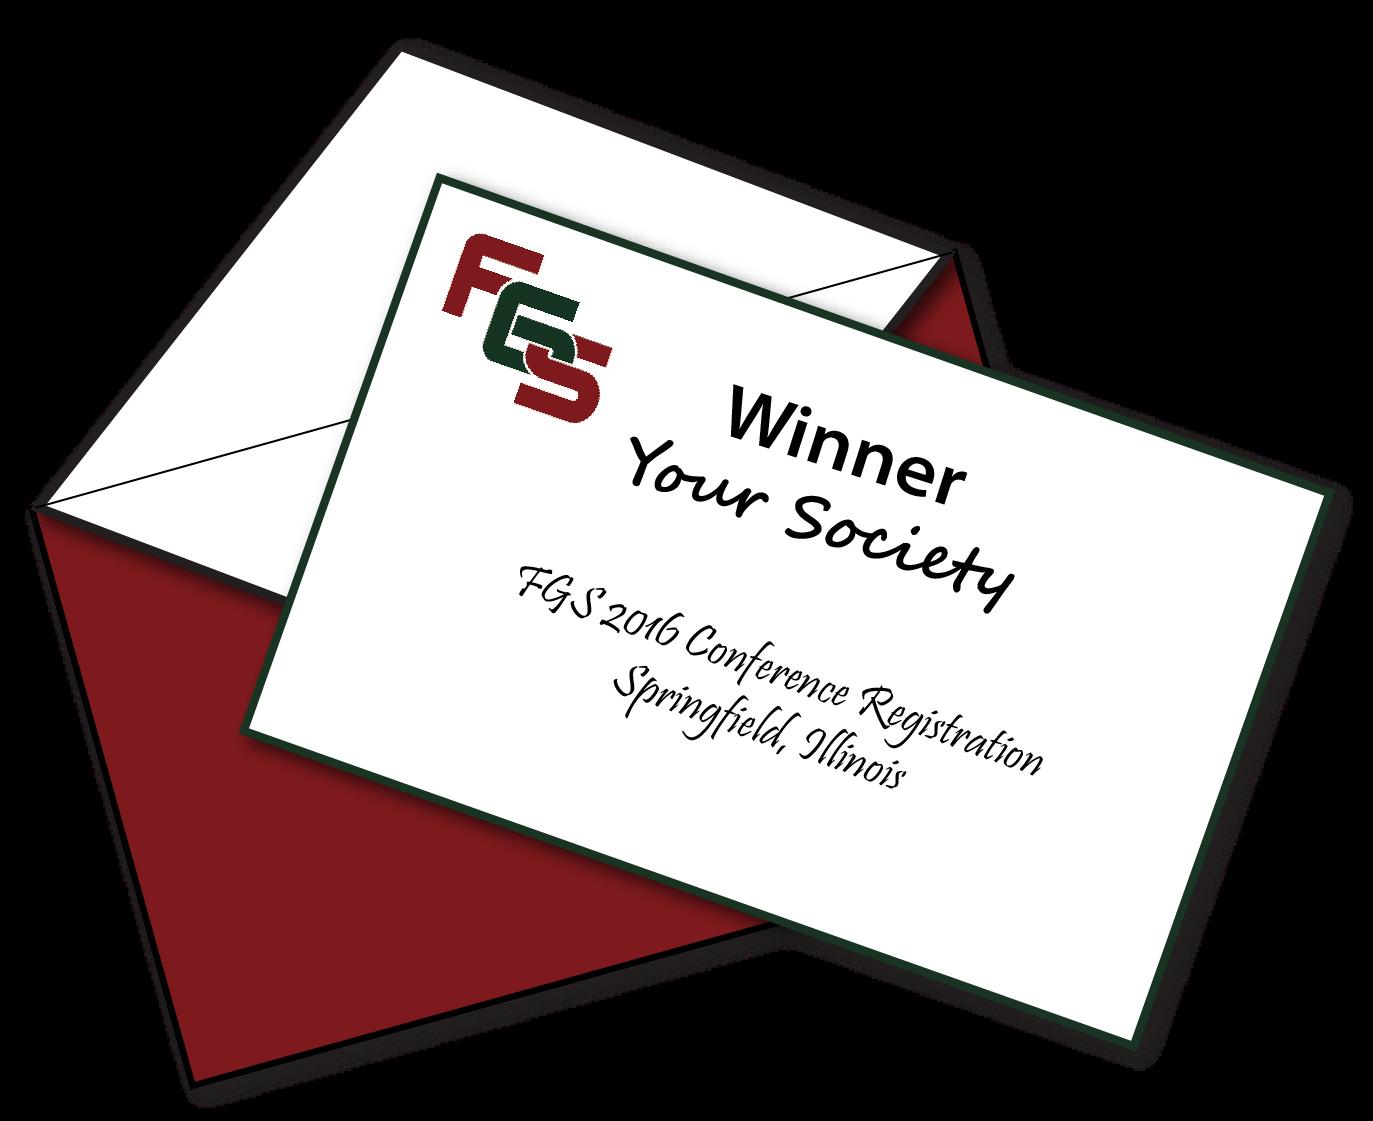 FGS 2015 Conference Publicity Contest